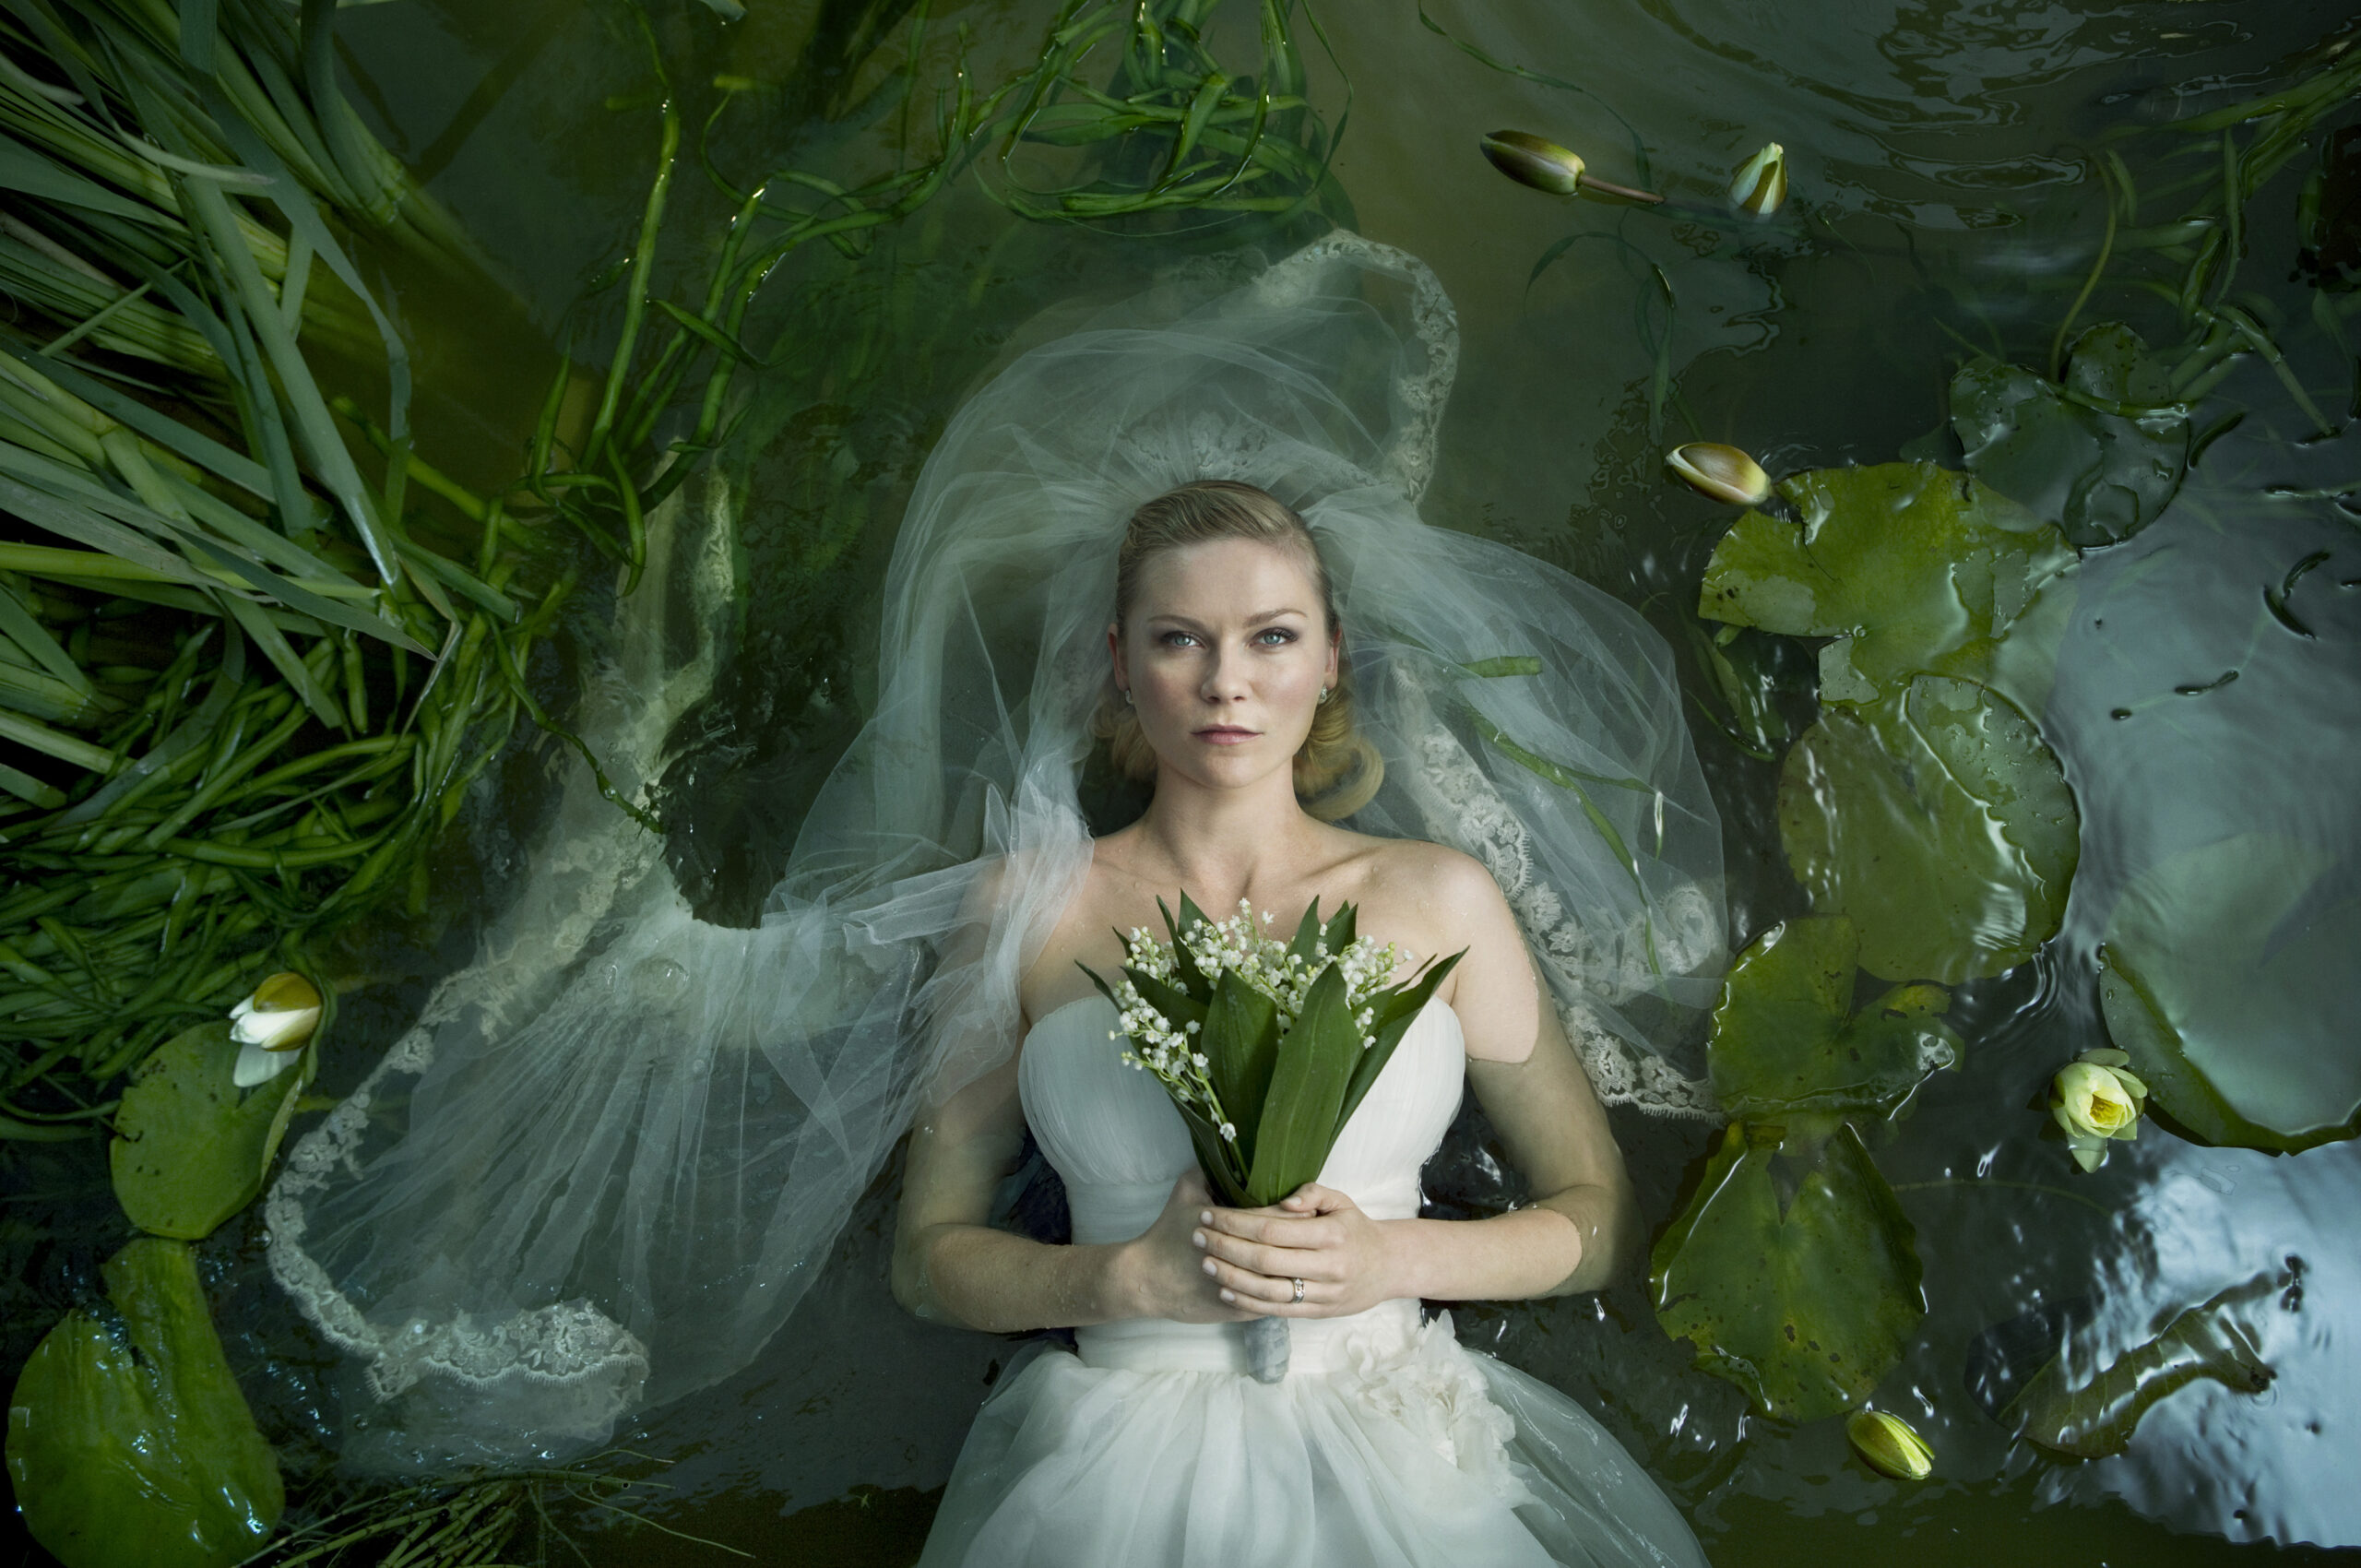 Melancholia (Lars von Trier, 2011) - Credits: BiM Distribuzione/Christian Geisnaes